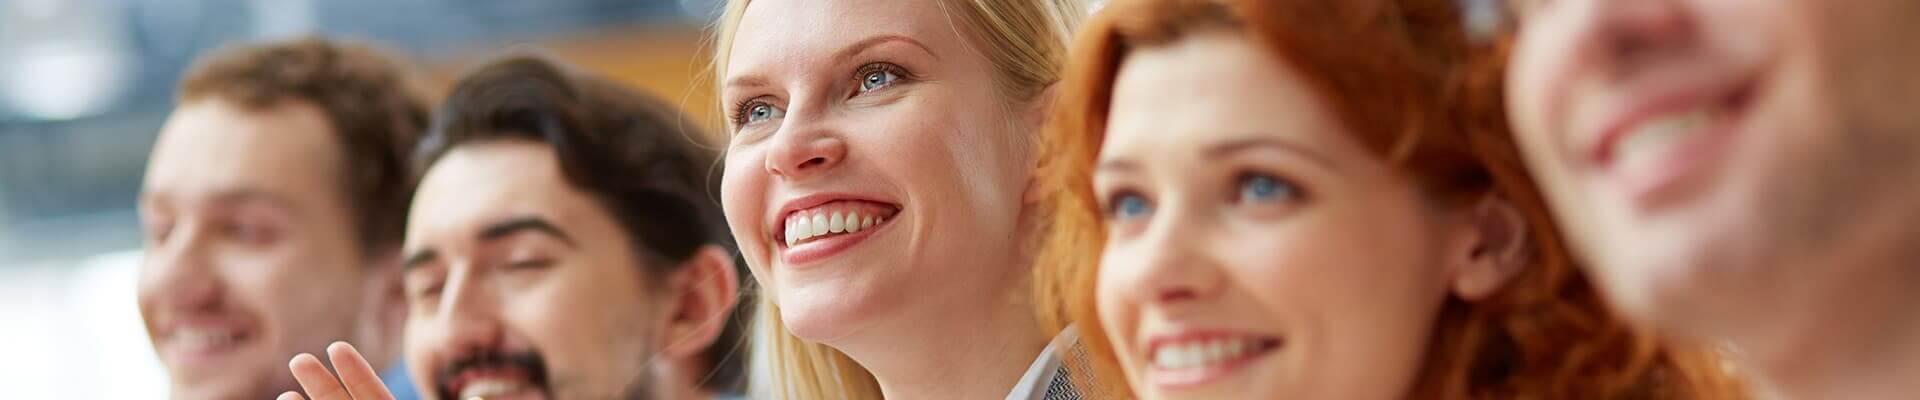 Customer Service Training Australia Conference Presentations